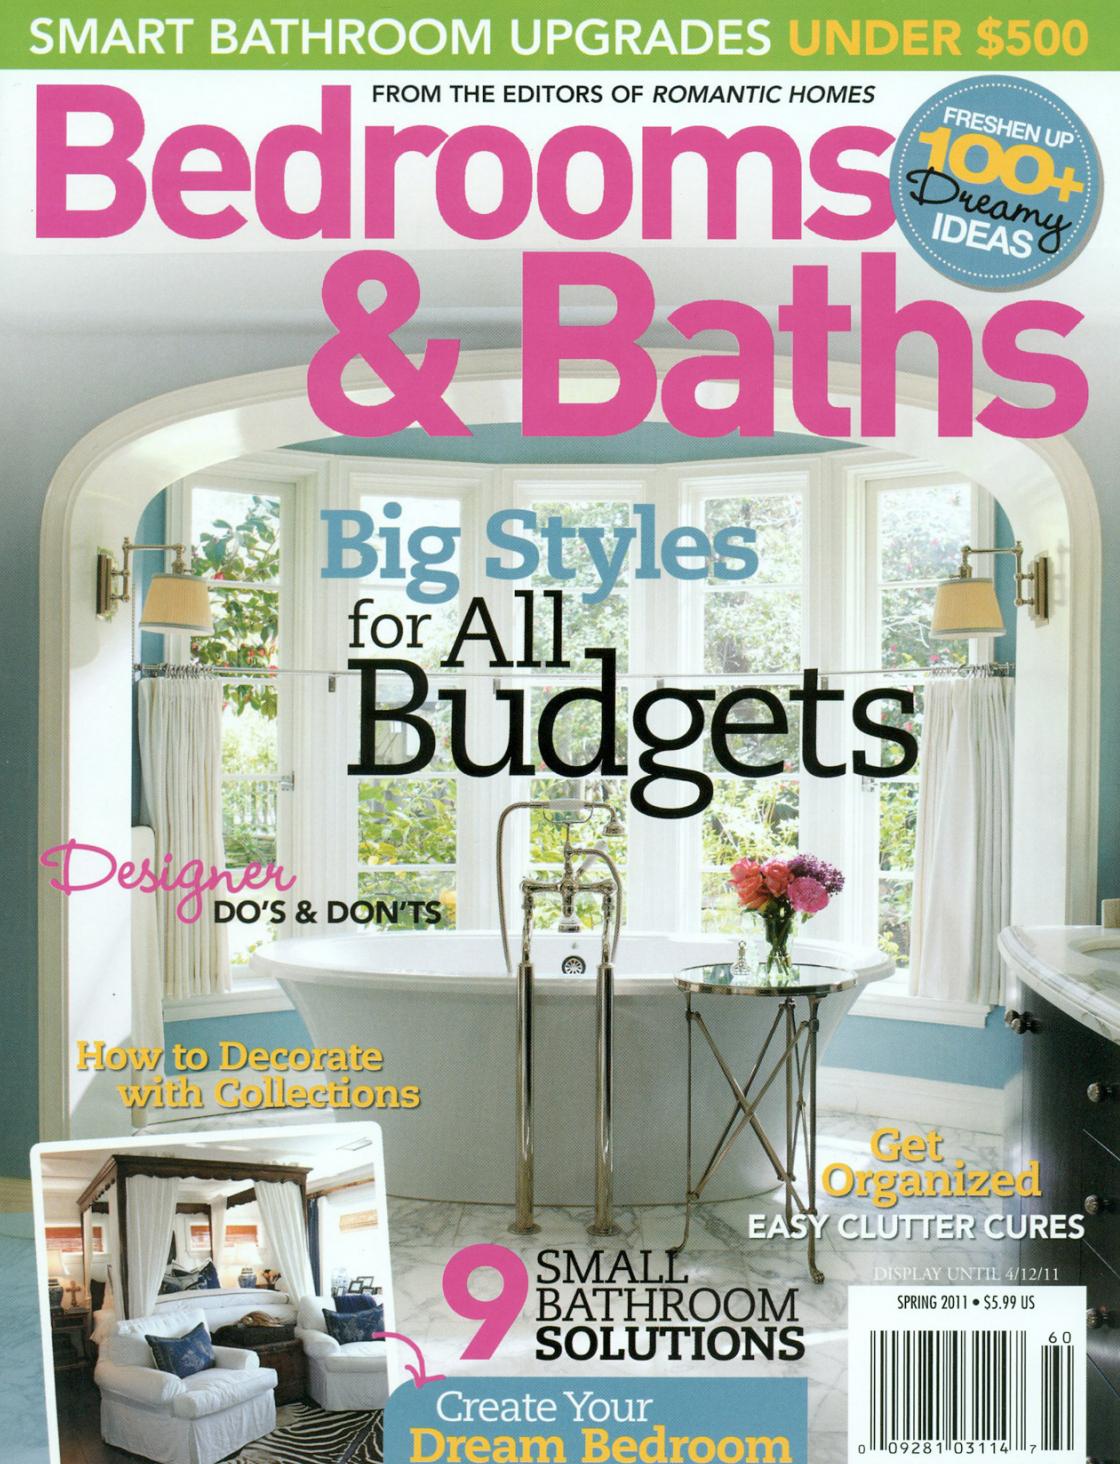 Spring 2011, Bedrooms & Bathrooms Magazine